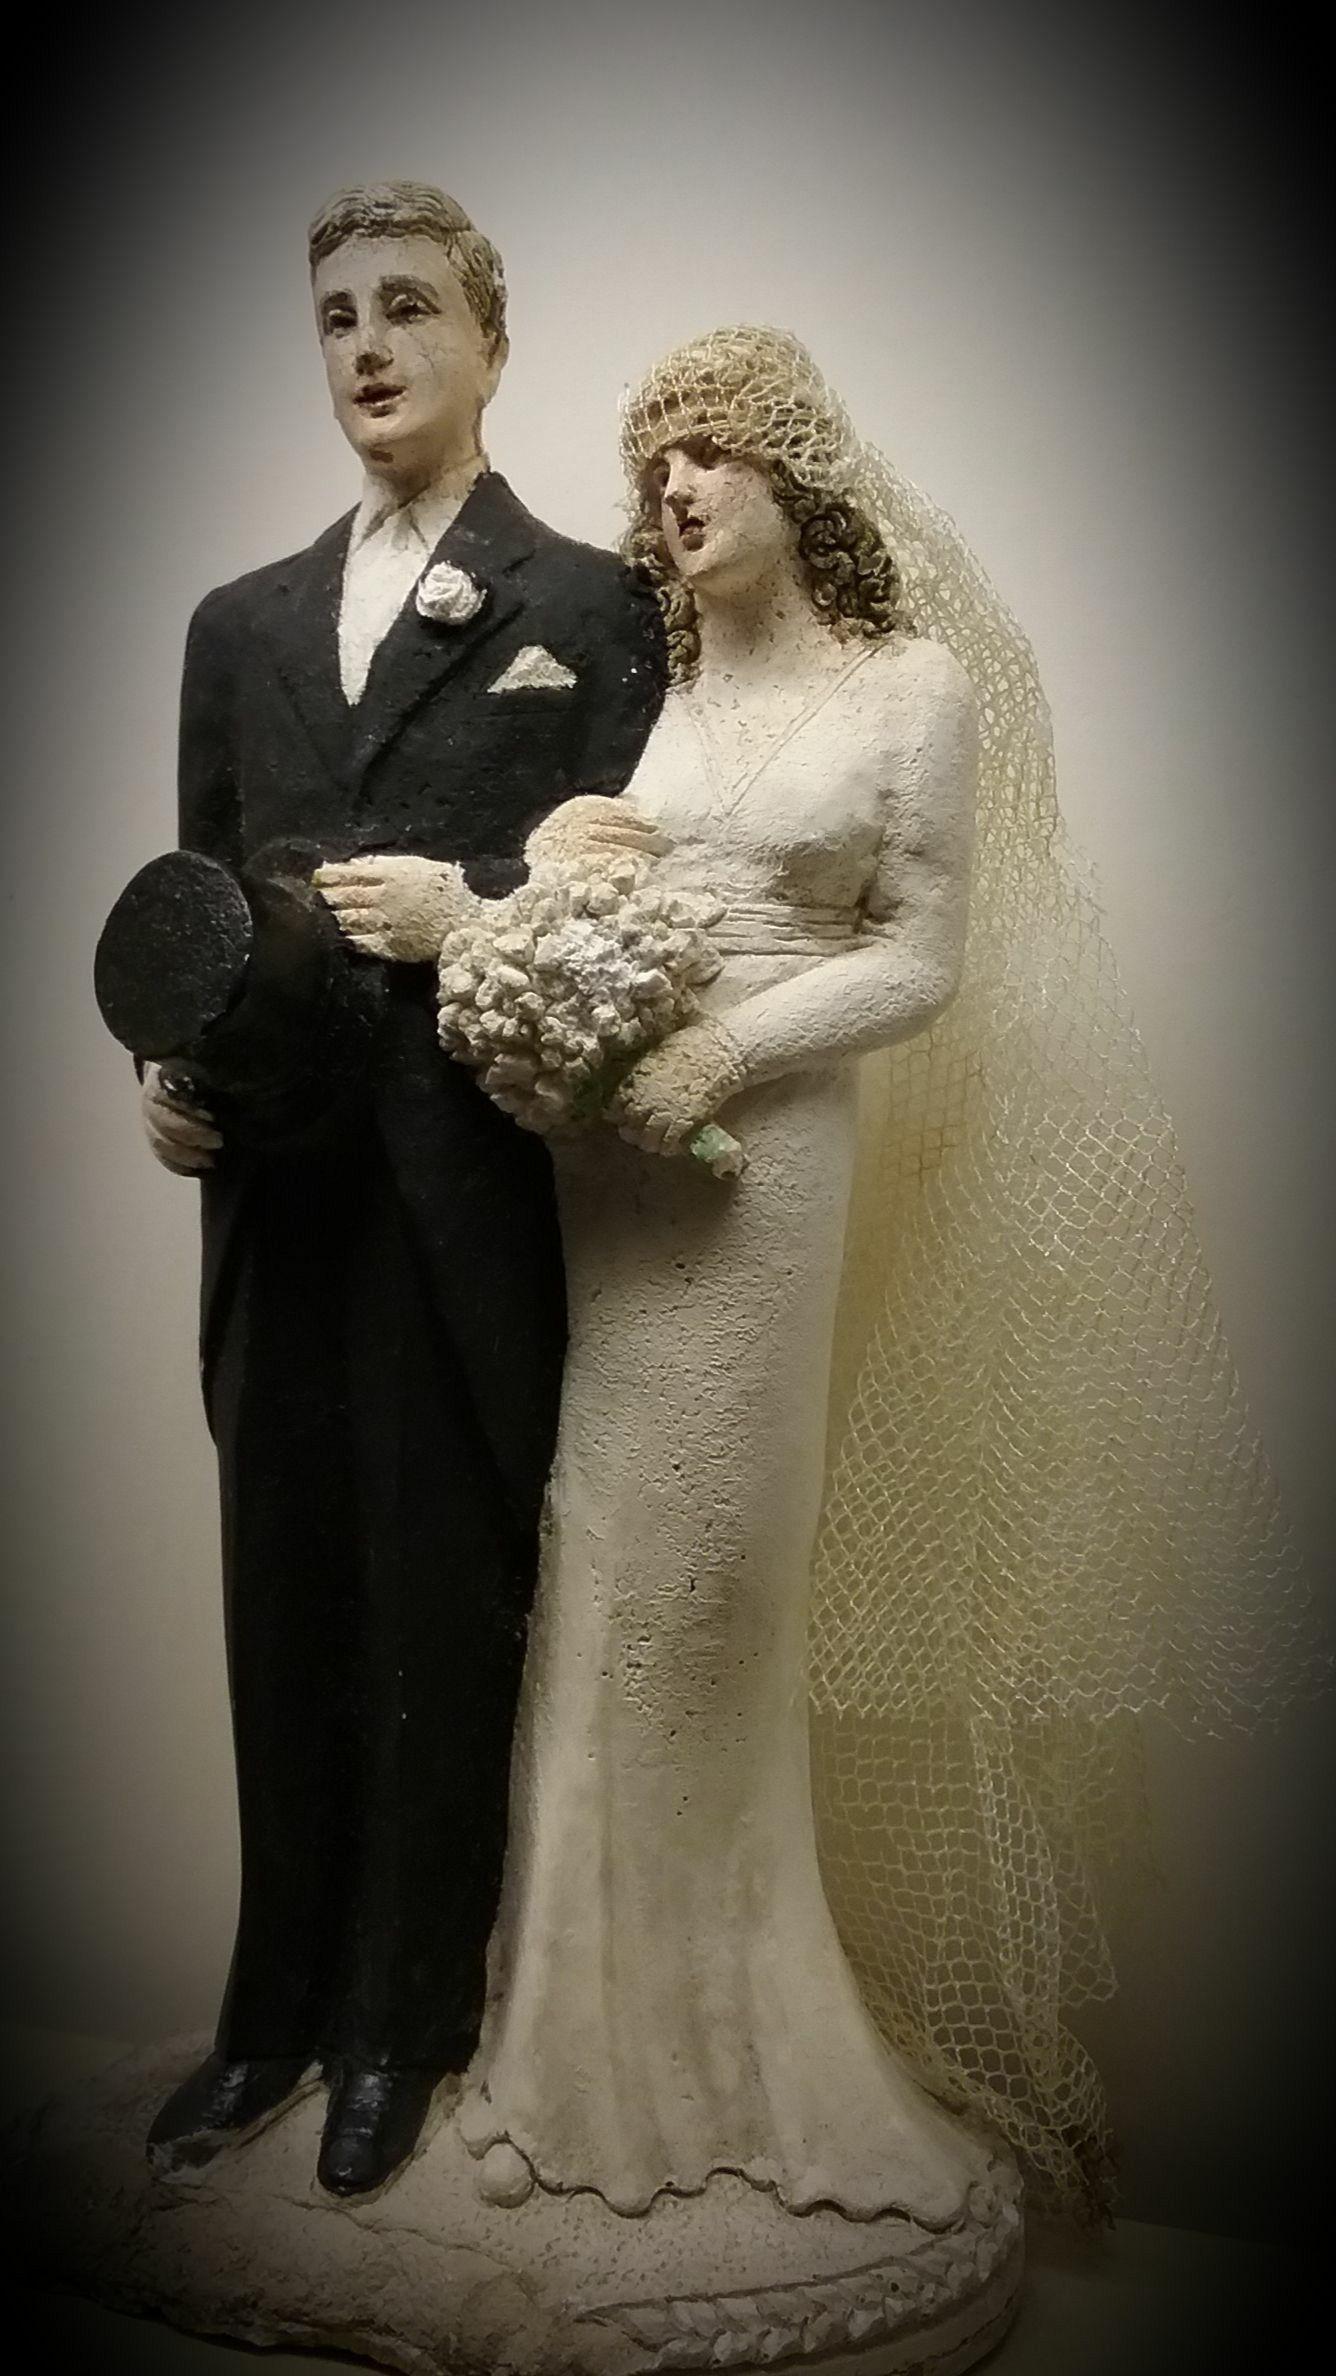 1940 wedding dress   wedding Cake Topper weddingcakes  cakes  Pinterest  Wedding